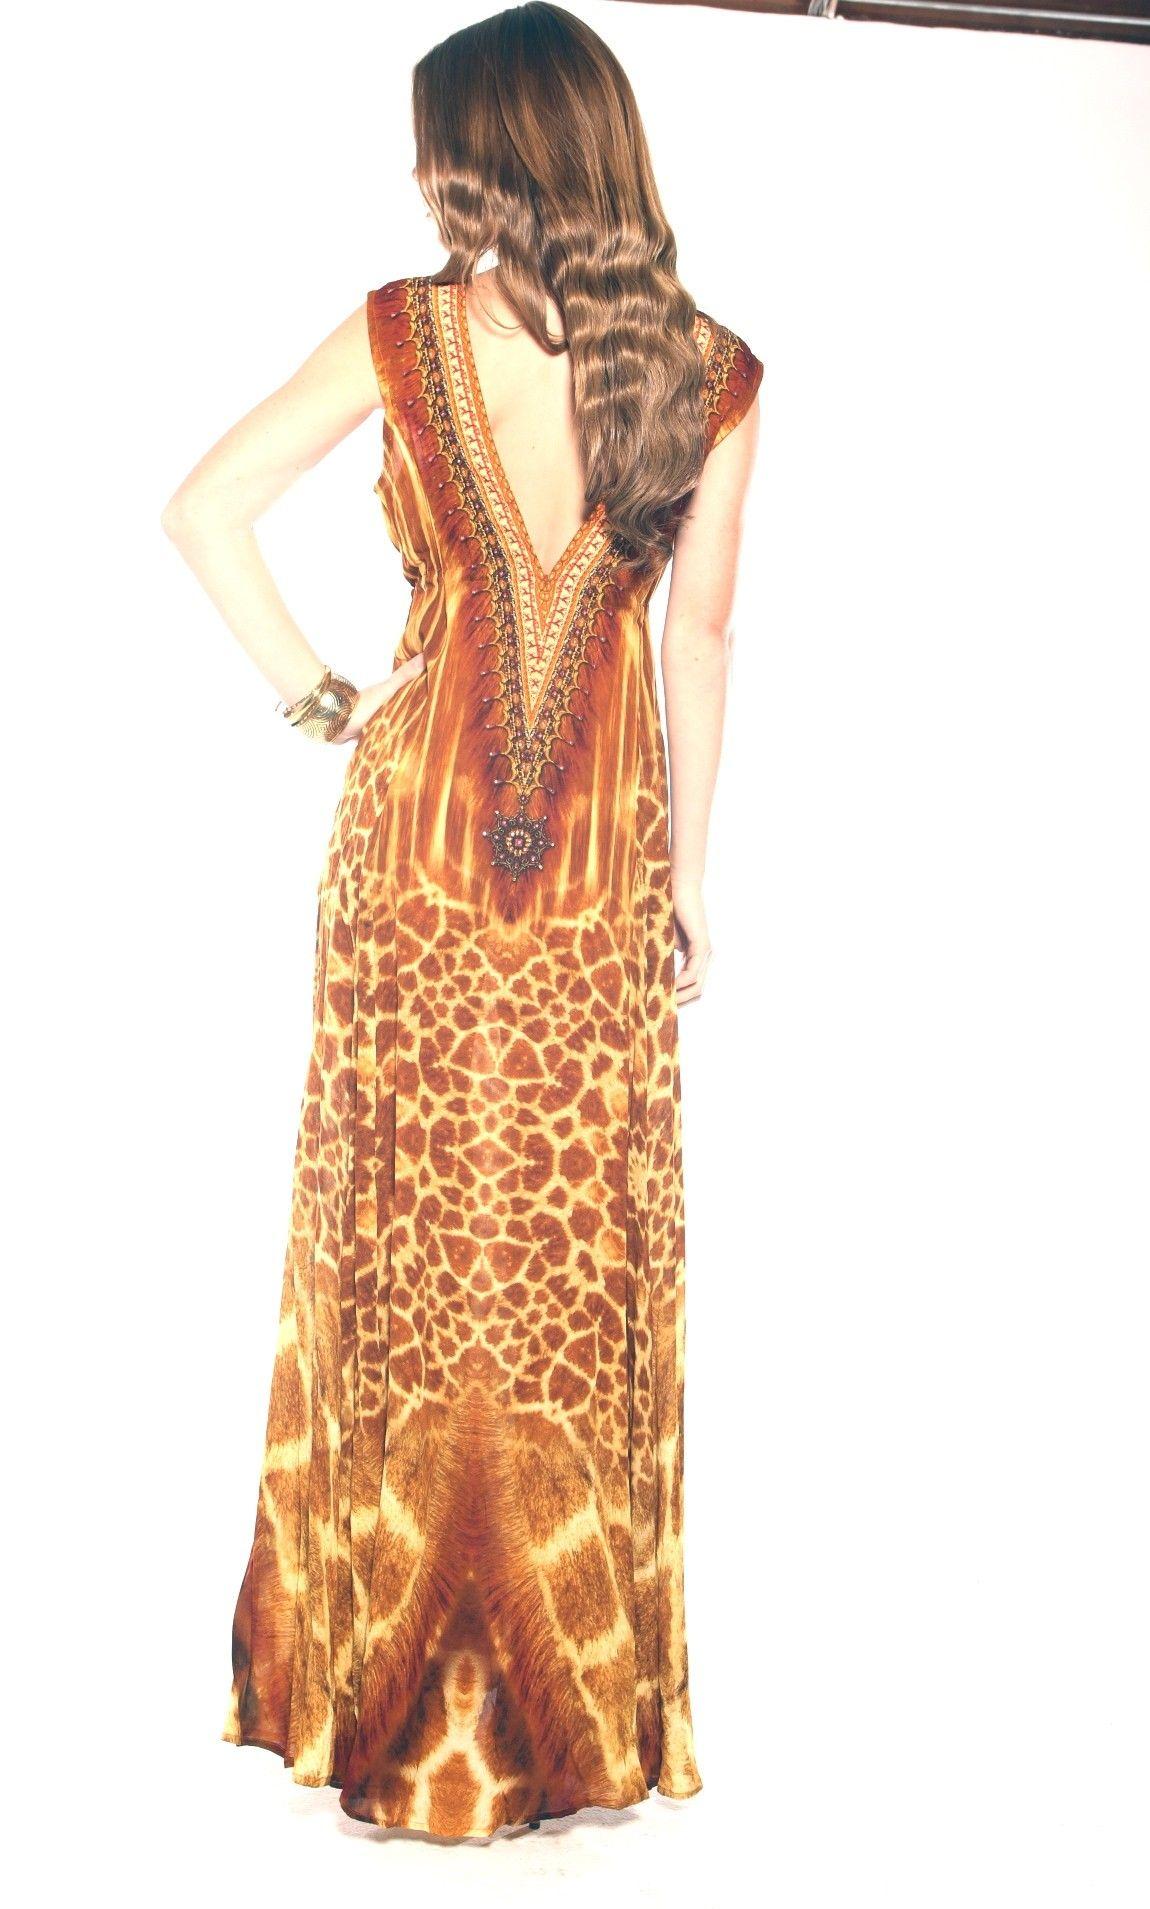 f2d4cdba19 Shahida Parides DEEP V Jungle Print Fit and Flare hi low - Last Call Clearance  Sale - Shop Style